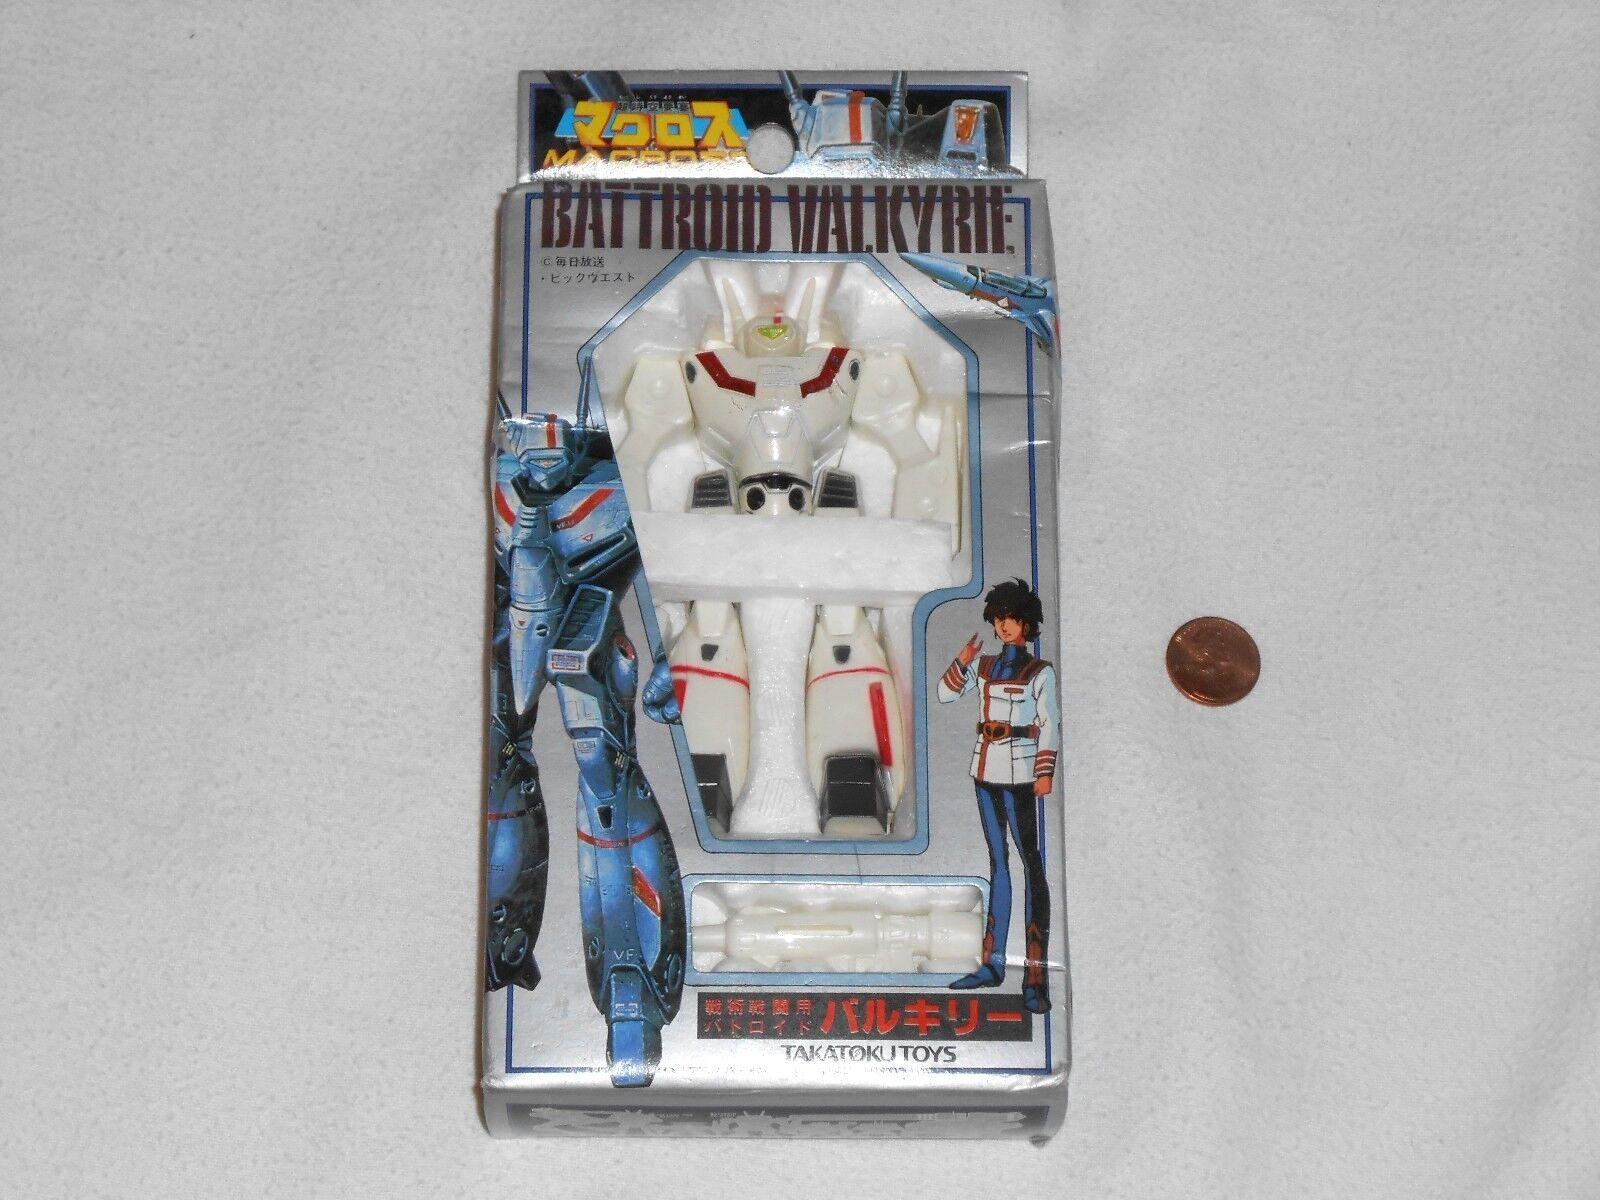 NEW Macross BATTROID VALKYRIE VF-1J Figure Takatoku Toys 4.5  Japan Robotech